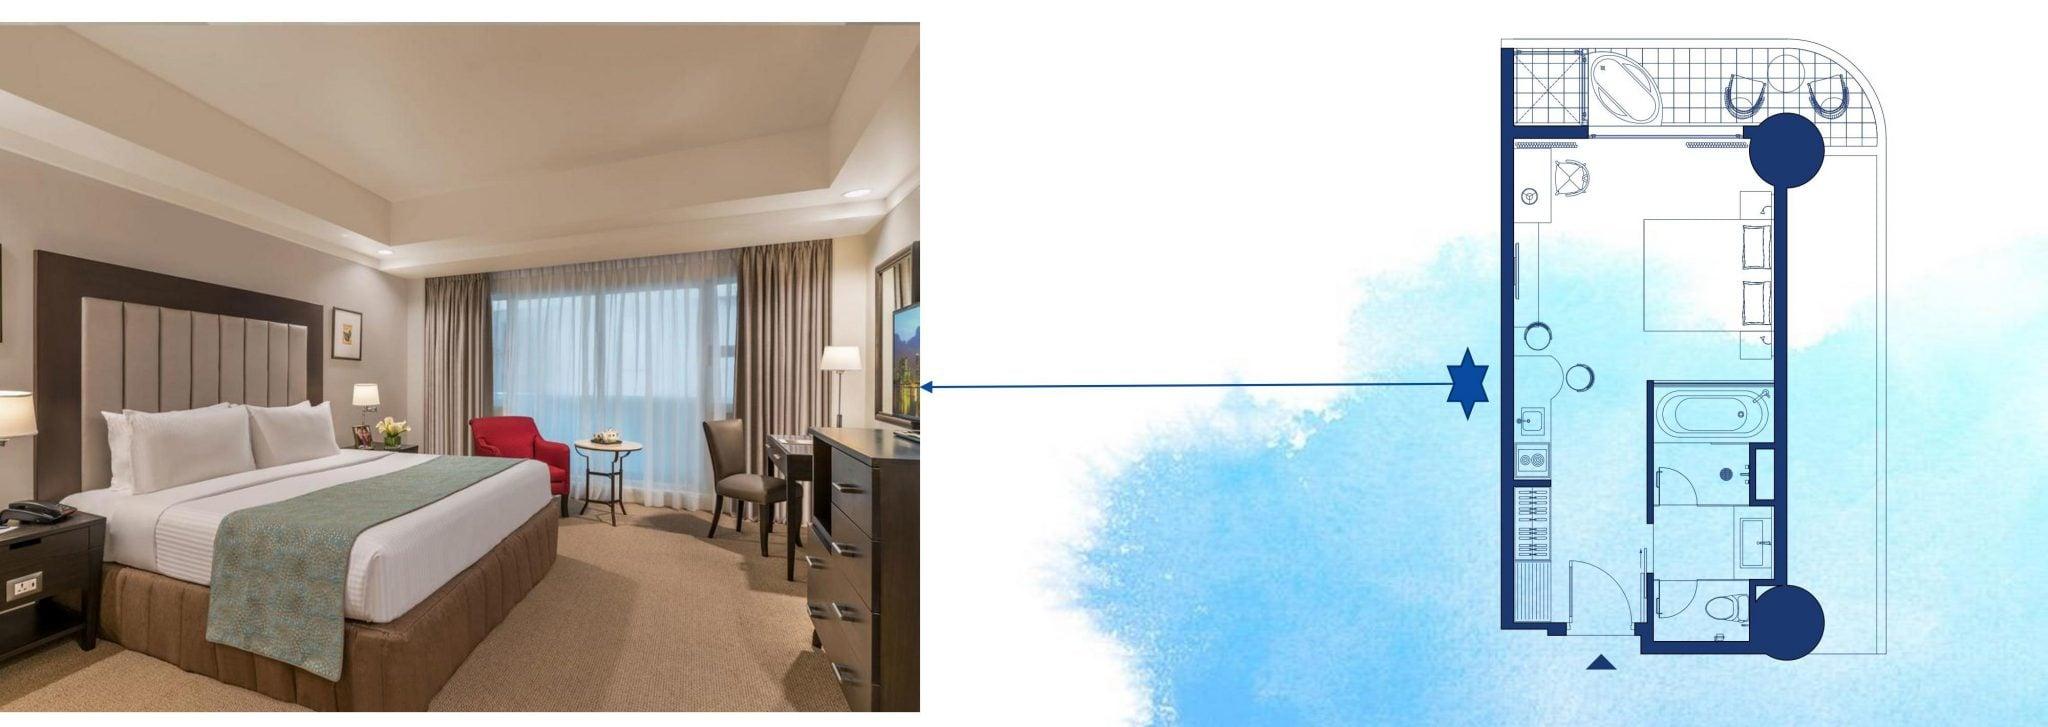 0044 e1563265465528 - Dự án căn hộ condotel Cam Ranh Bay - Pearl Cam Ranh